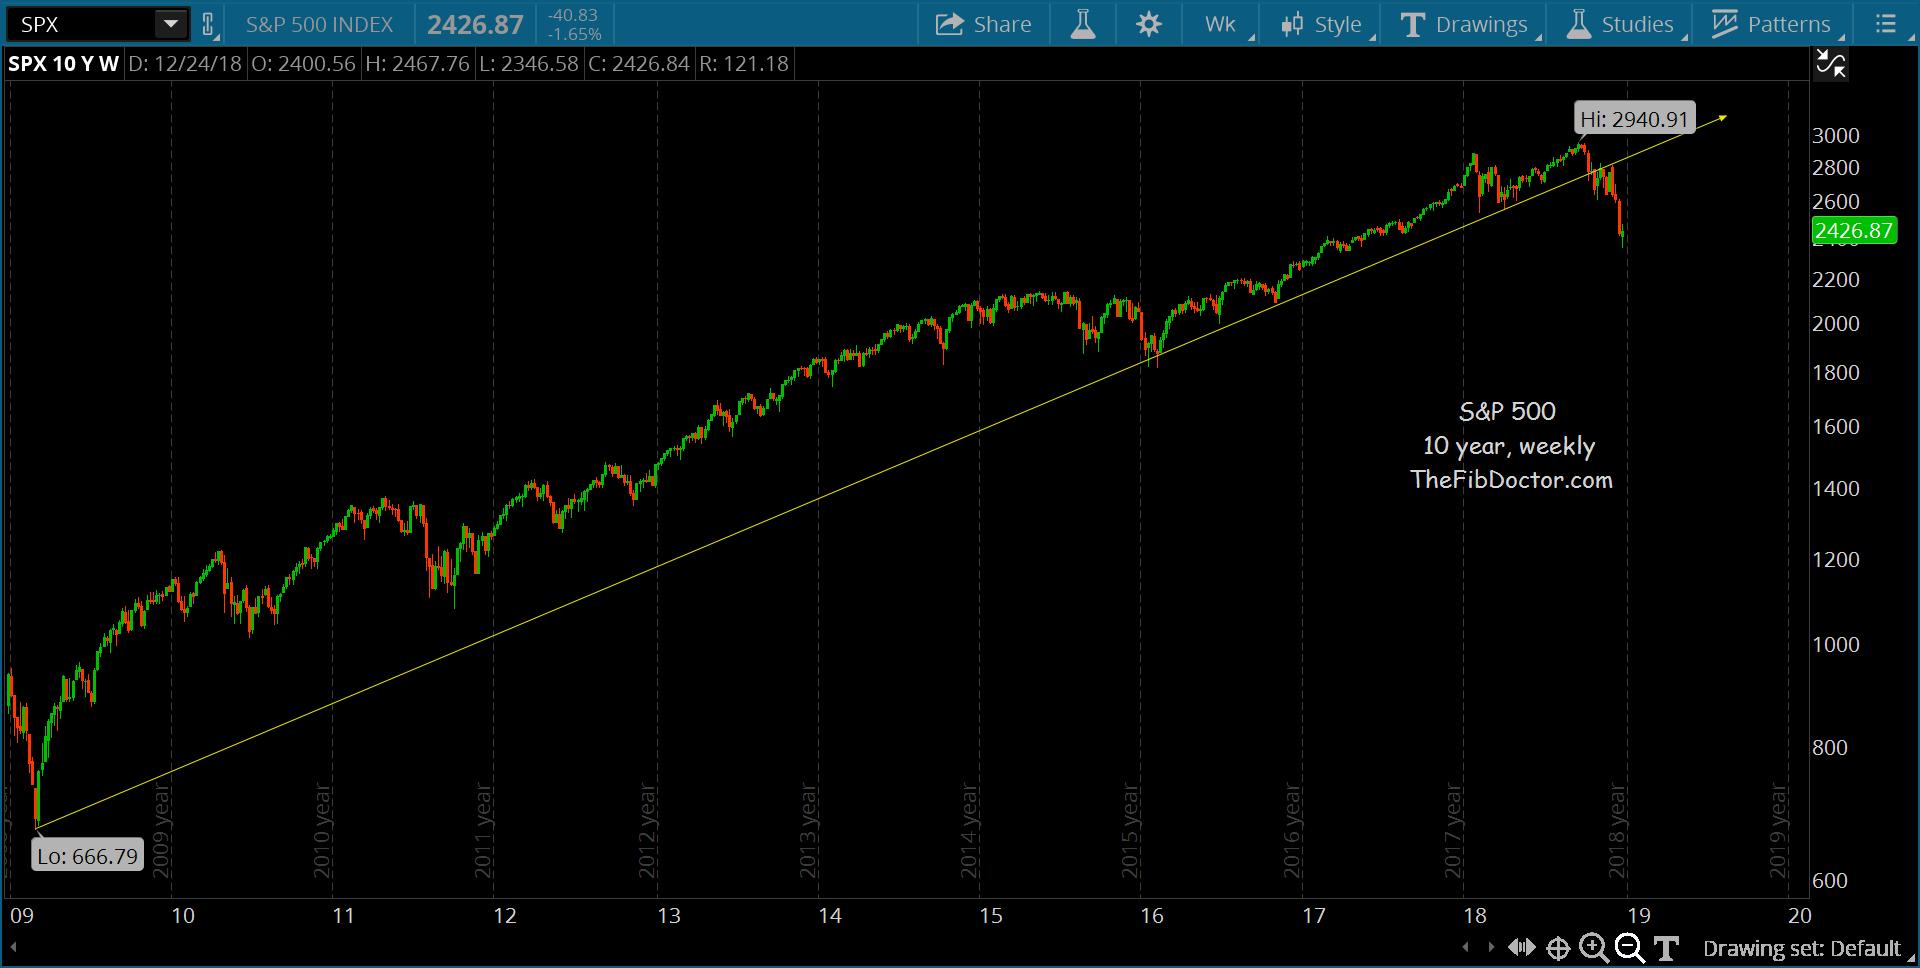 s&p 500 index stock market correction investing chart long term trend line break